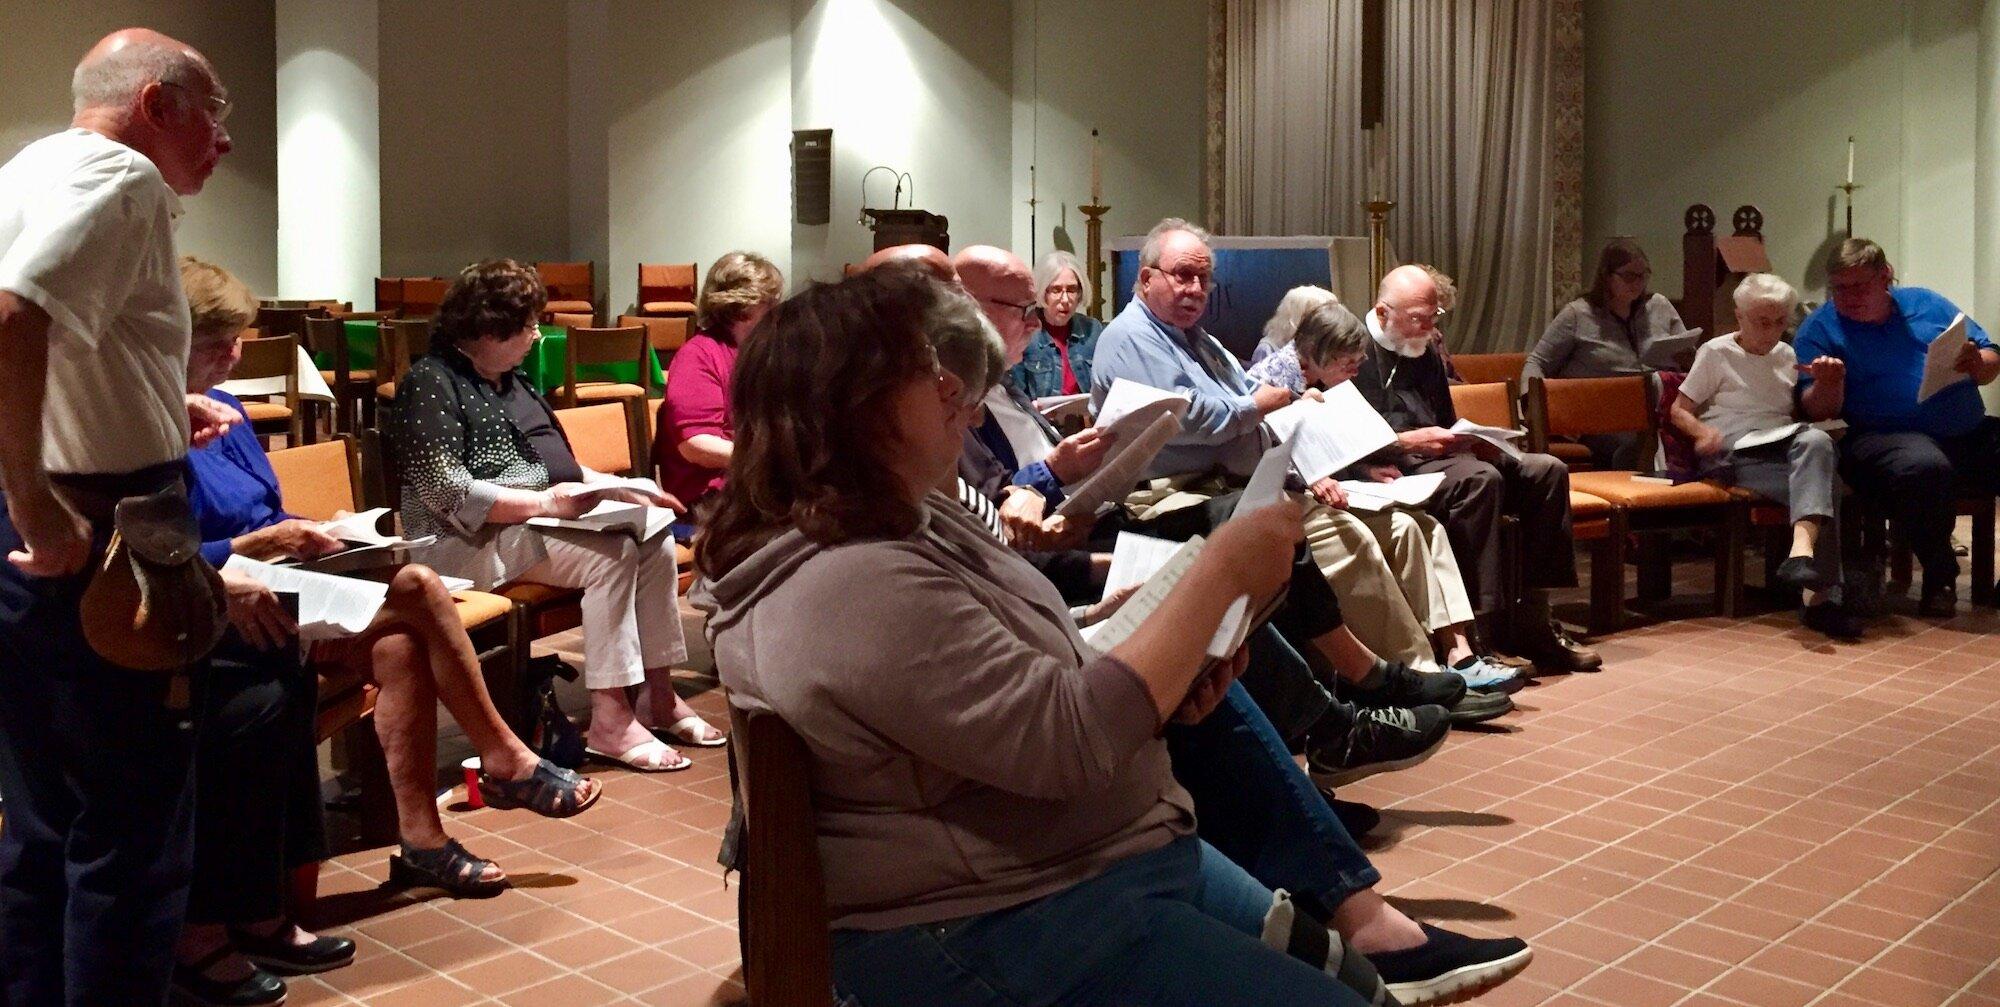 Preparing for the hymn sing